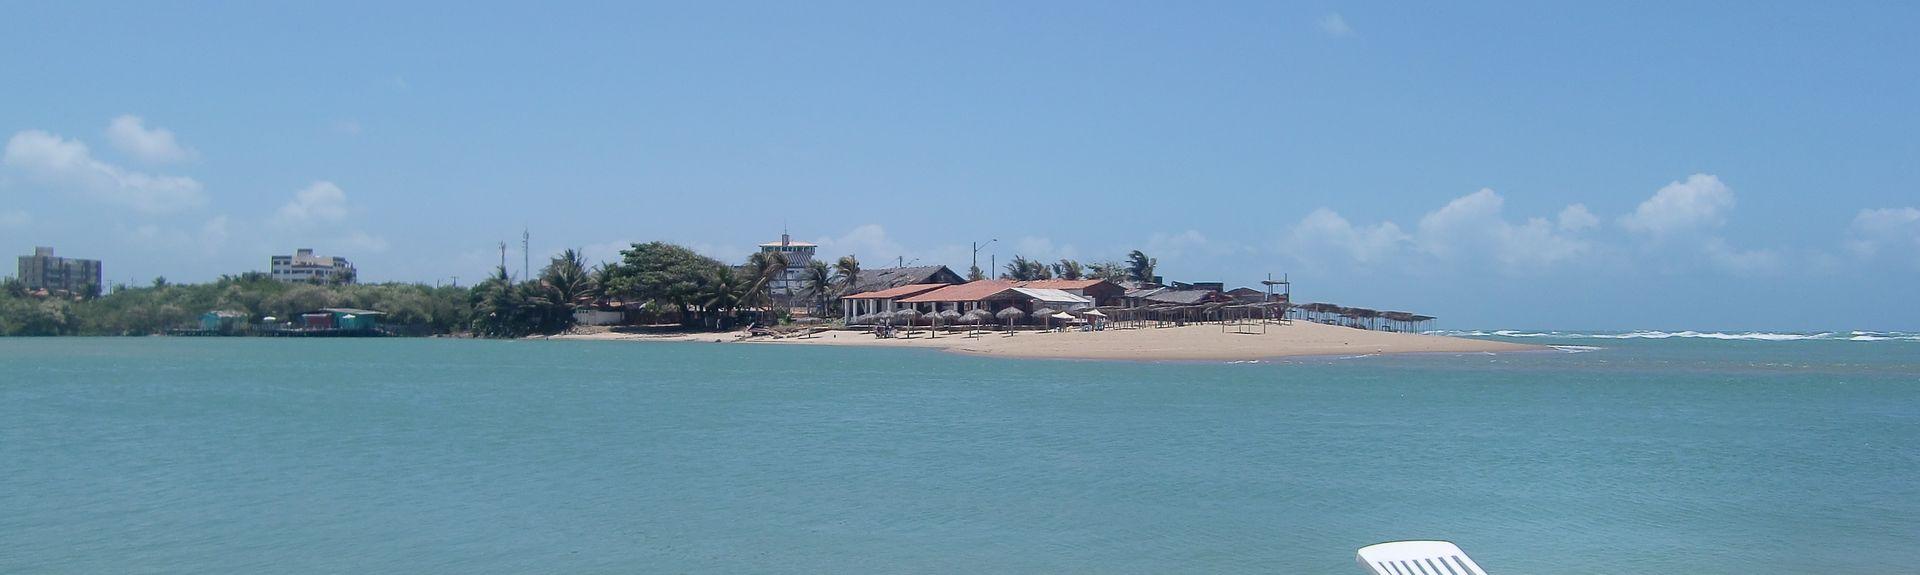 Praia de Iracema, Fortaleza, State of Ceará, BR